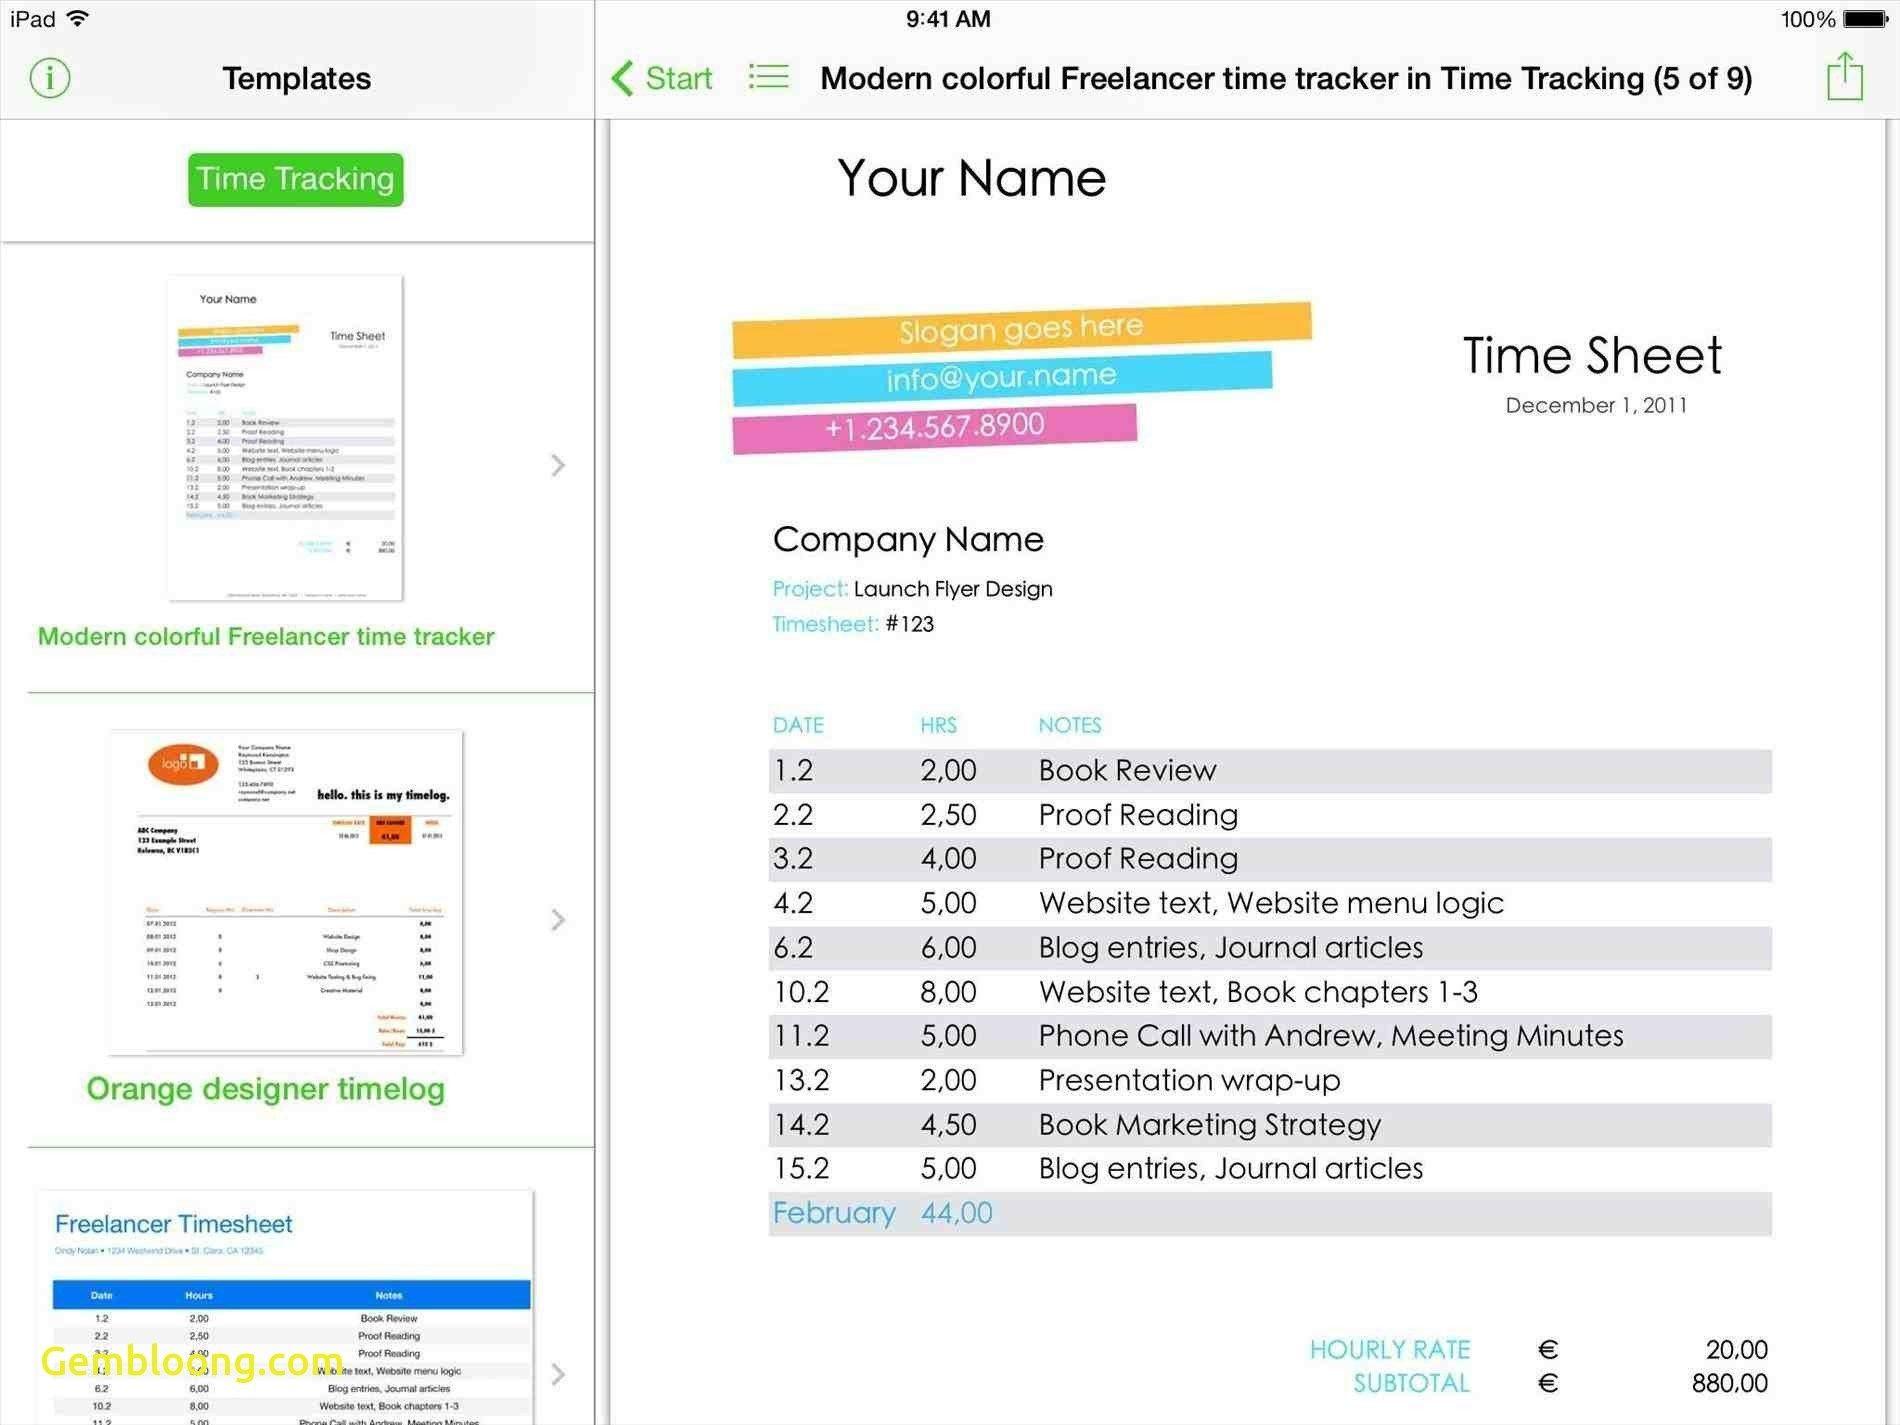 Indirect Method Cash Flow Worksheet Printable Worksheets And Activities For Teachers Parents Tutors And Homeschool Families